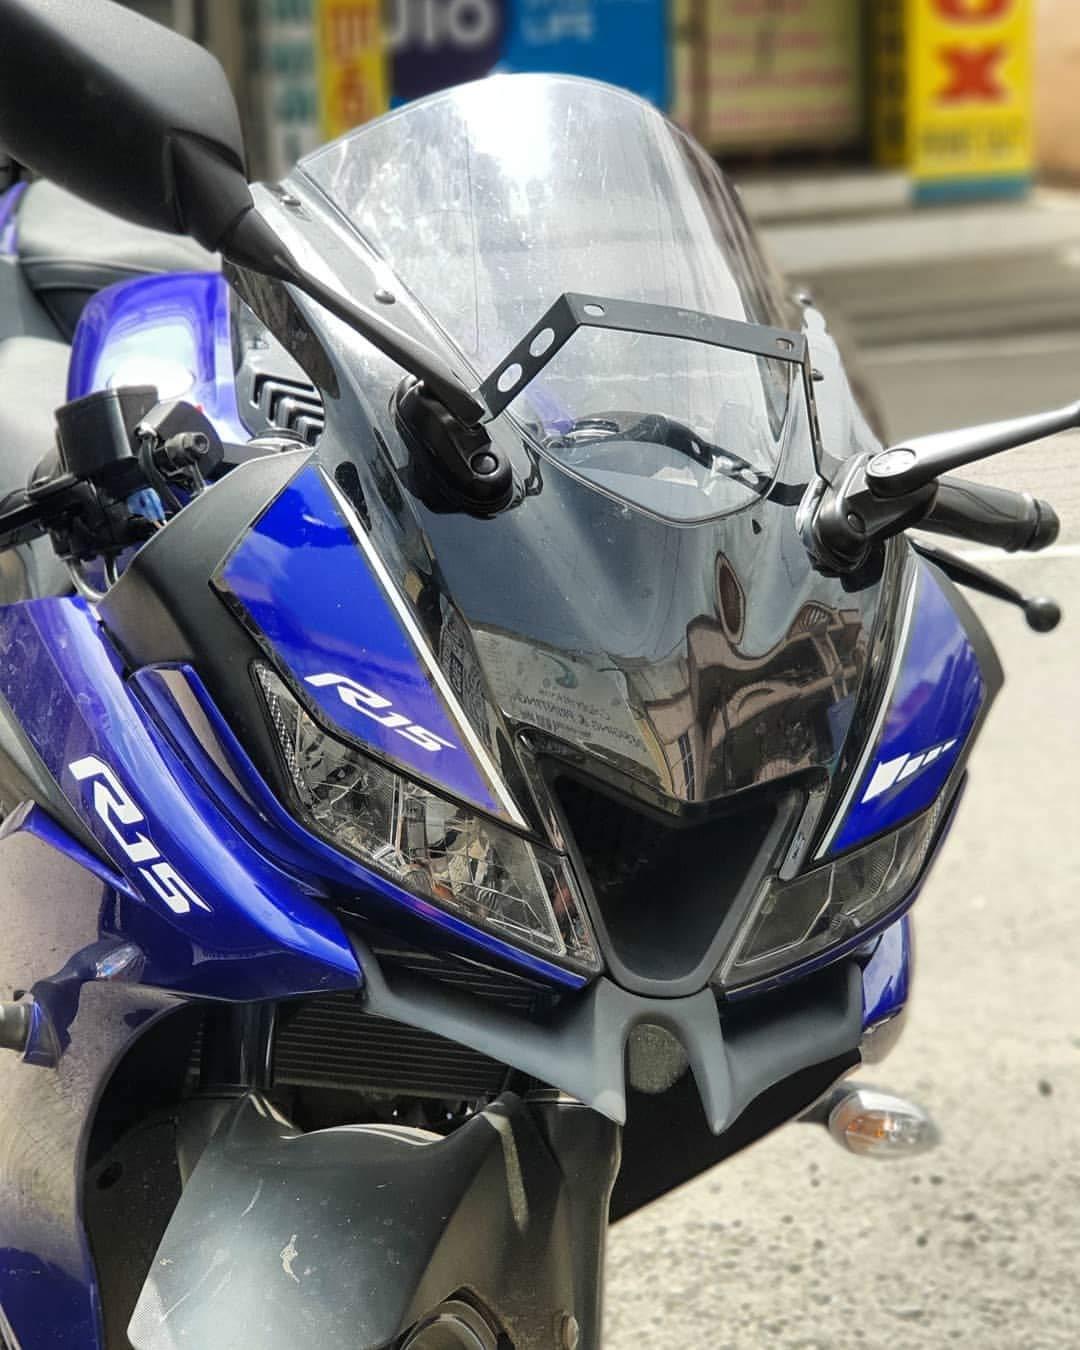 Saiga Parts FRP Bike Winglet for Yamaha R15 V3 (T-1, Blue)